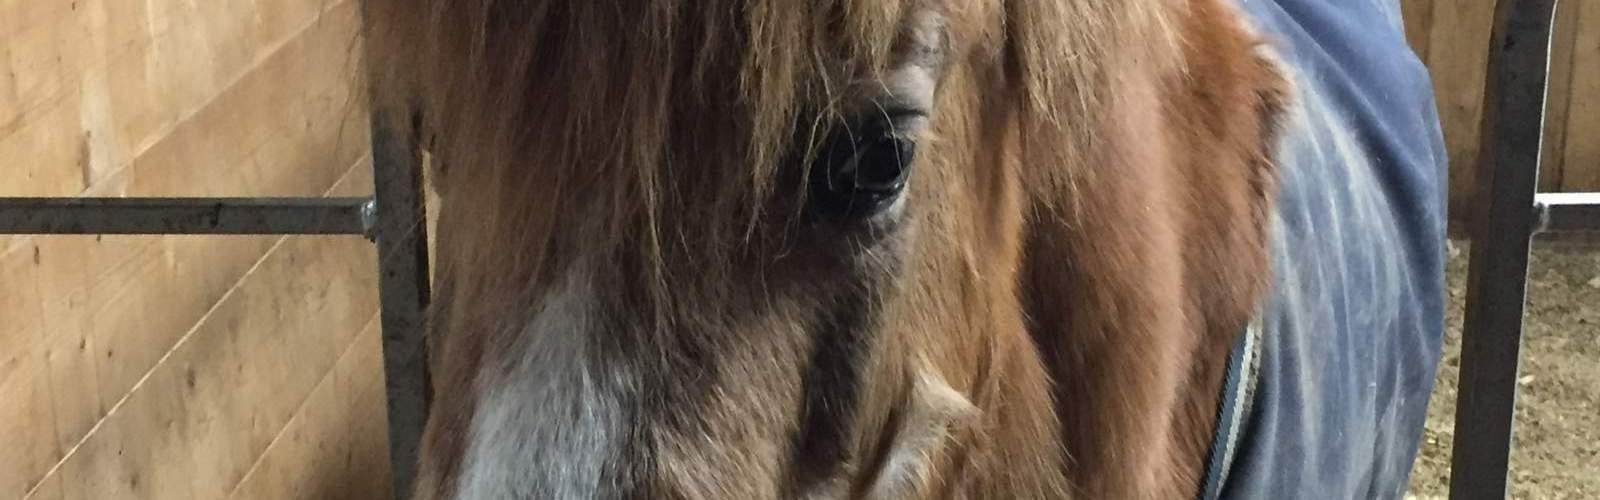 MarBill Hill Farm - Ginger - Headshot